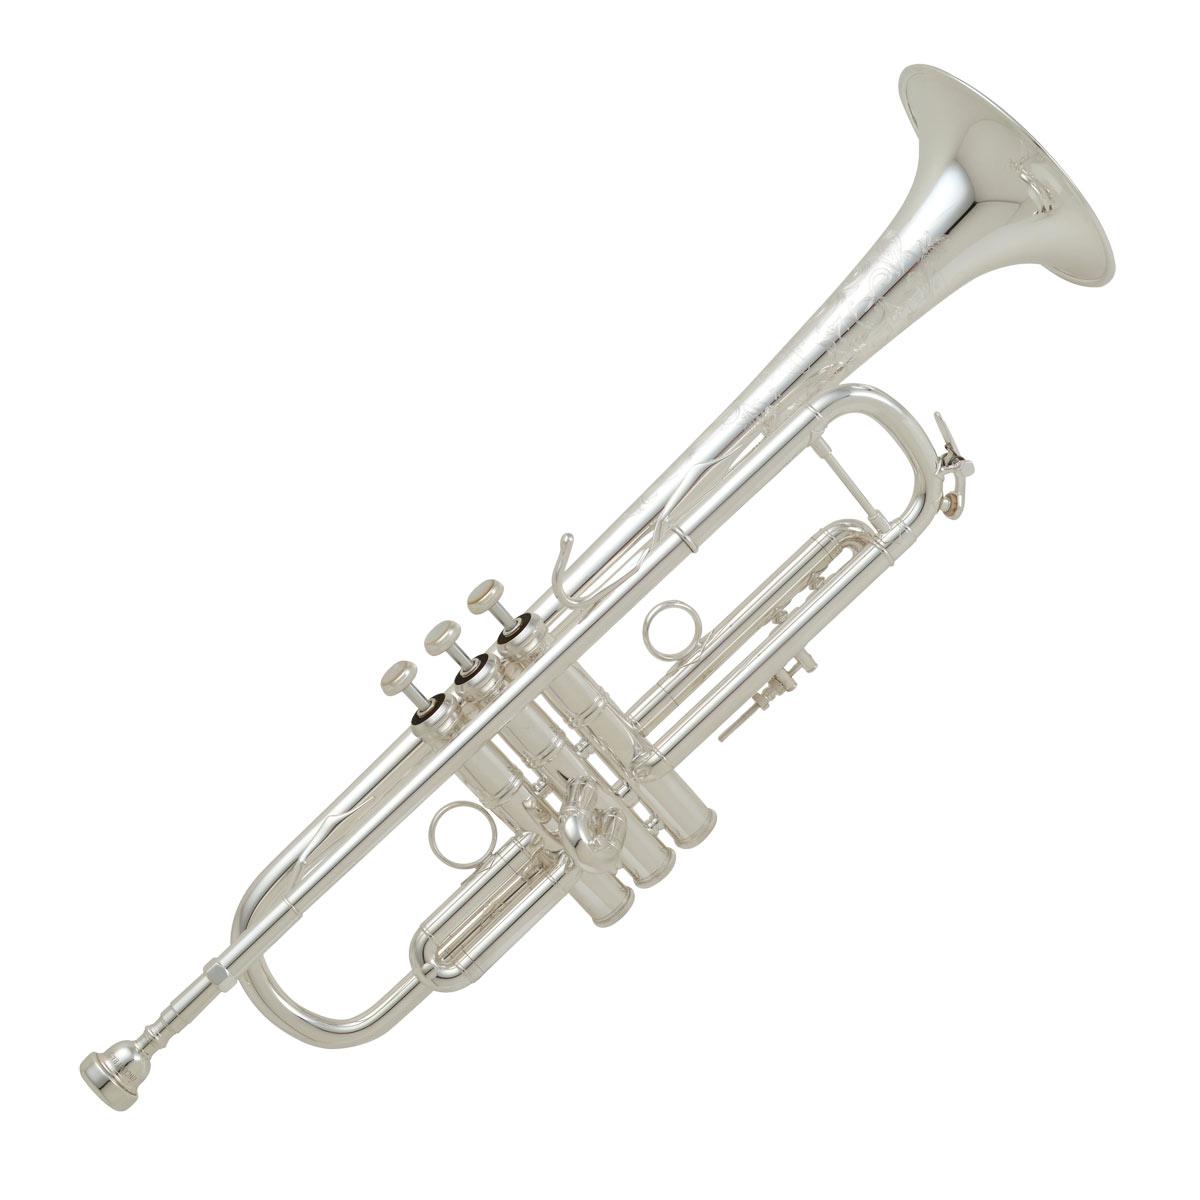 Bach / BIGCOPPER バック LR19043B SP ビッグコパー シルバーメッキ仕上げ B♭トランペット【お取り寄せ】【5年保証】